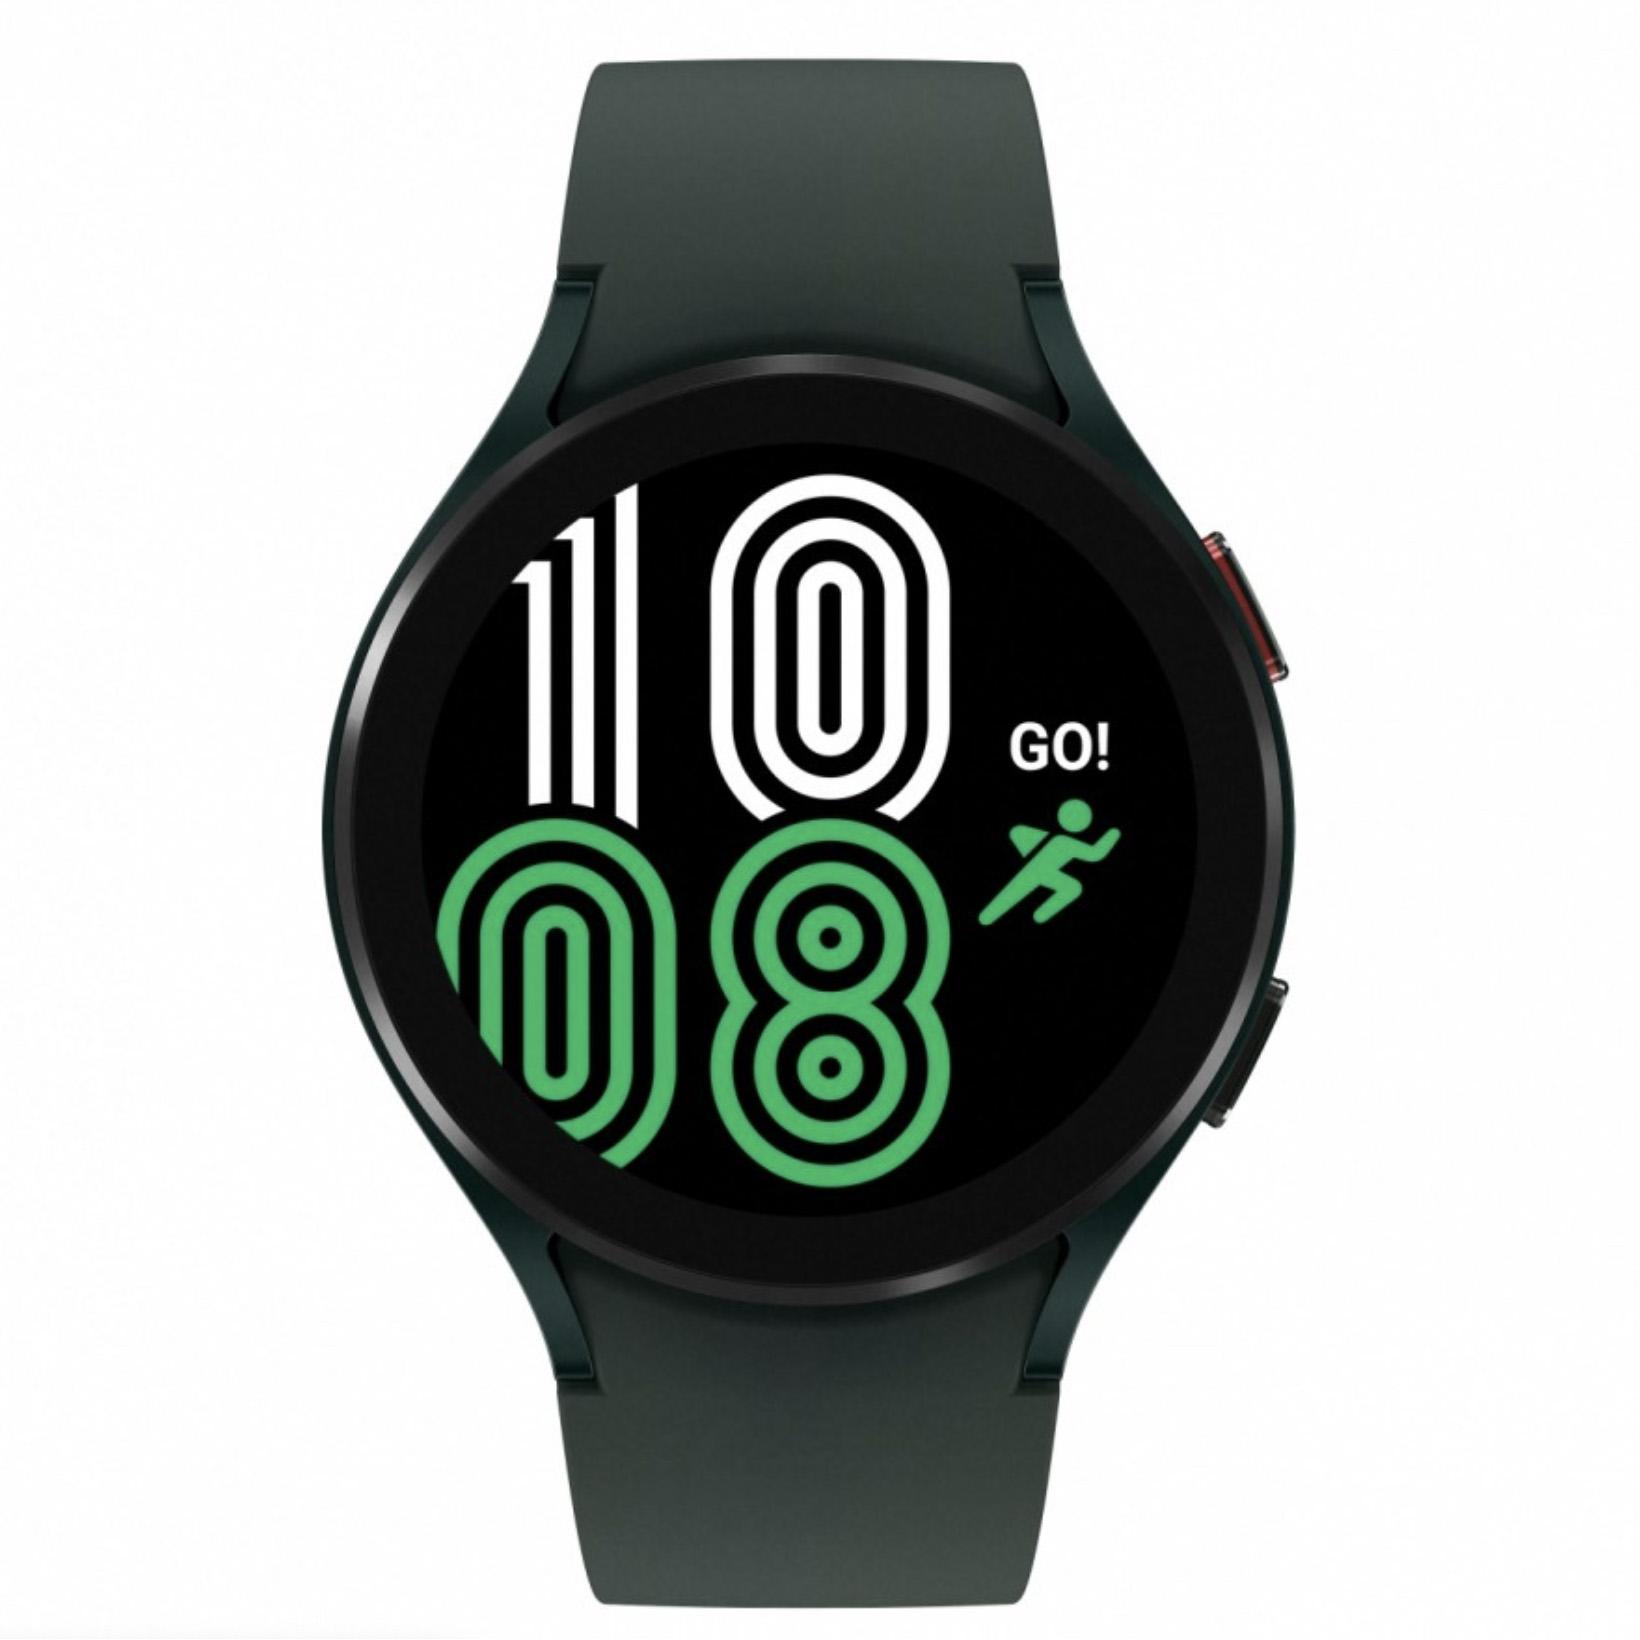 فروش نقدی و اقساطی ساعت هوشمند سامسونگ مدل Galaxy Watch4 40mm